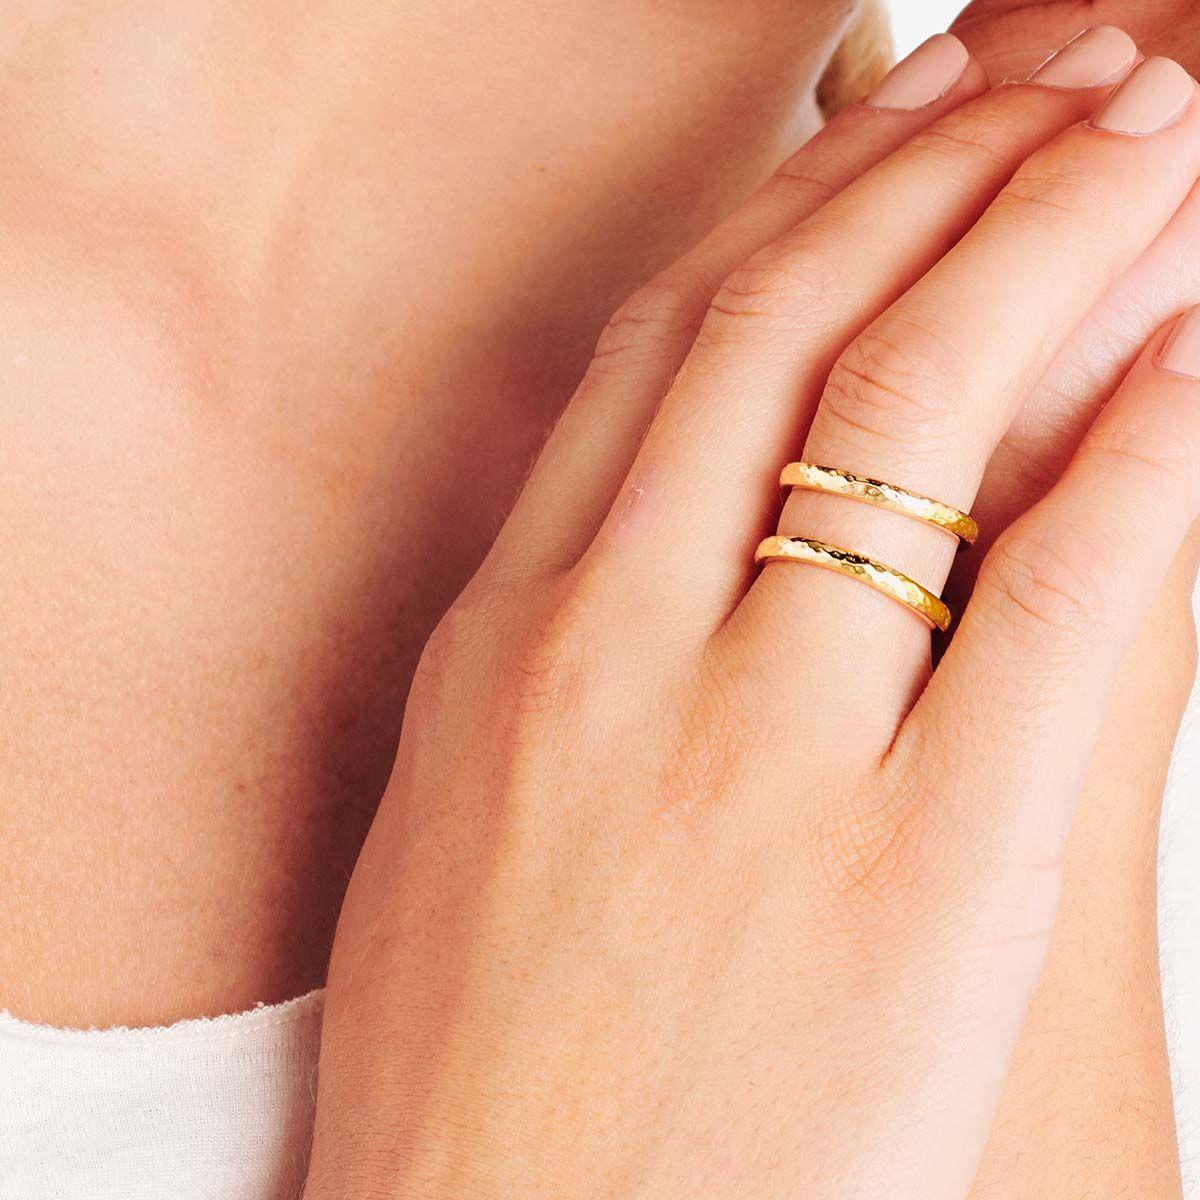 Double ring - Ringe - Silber